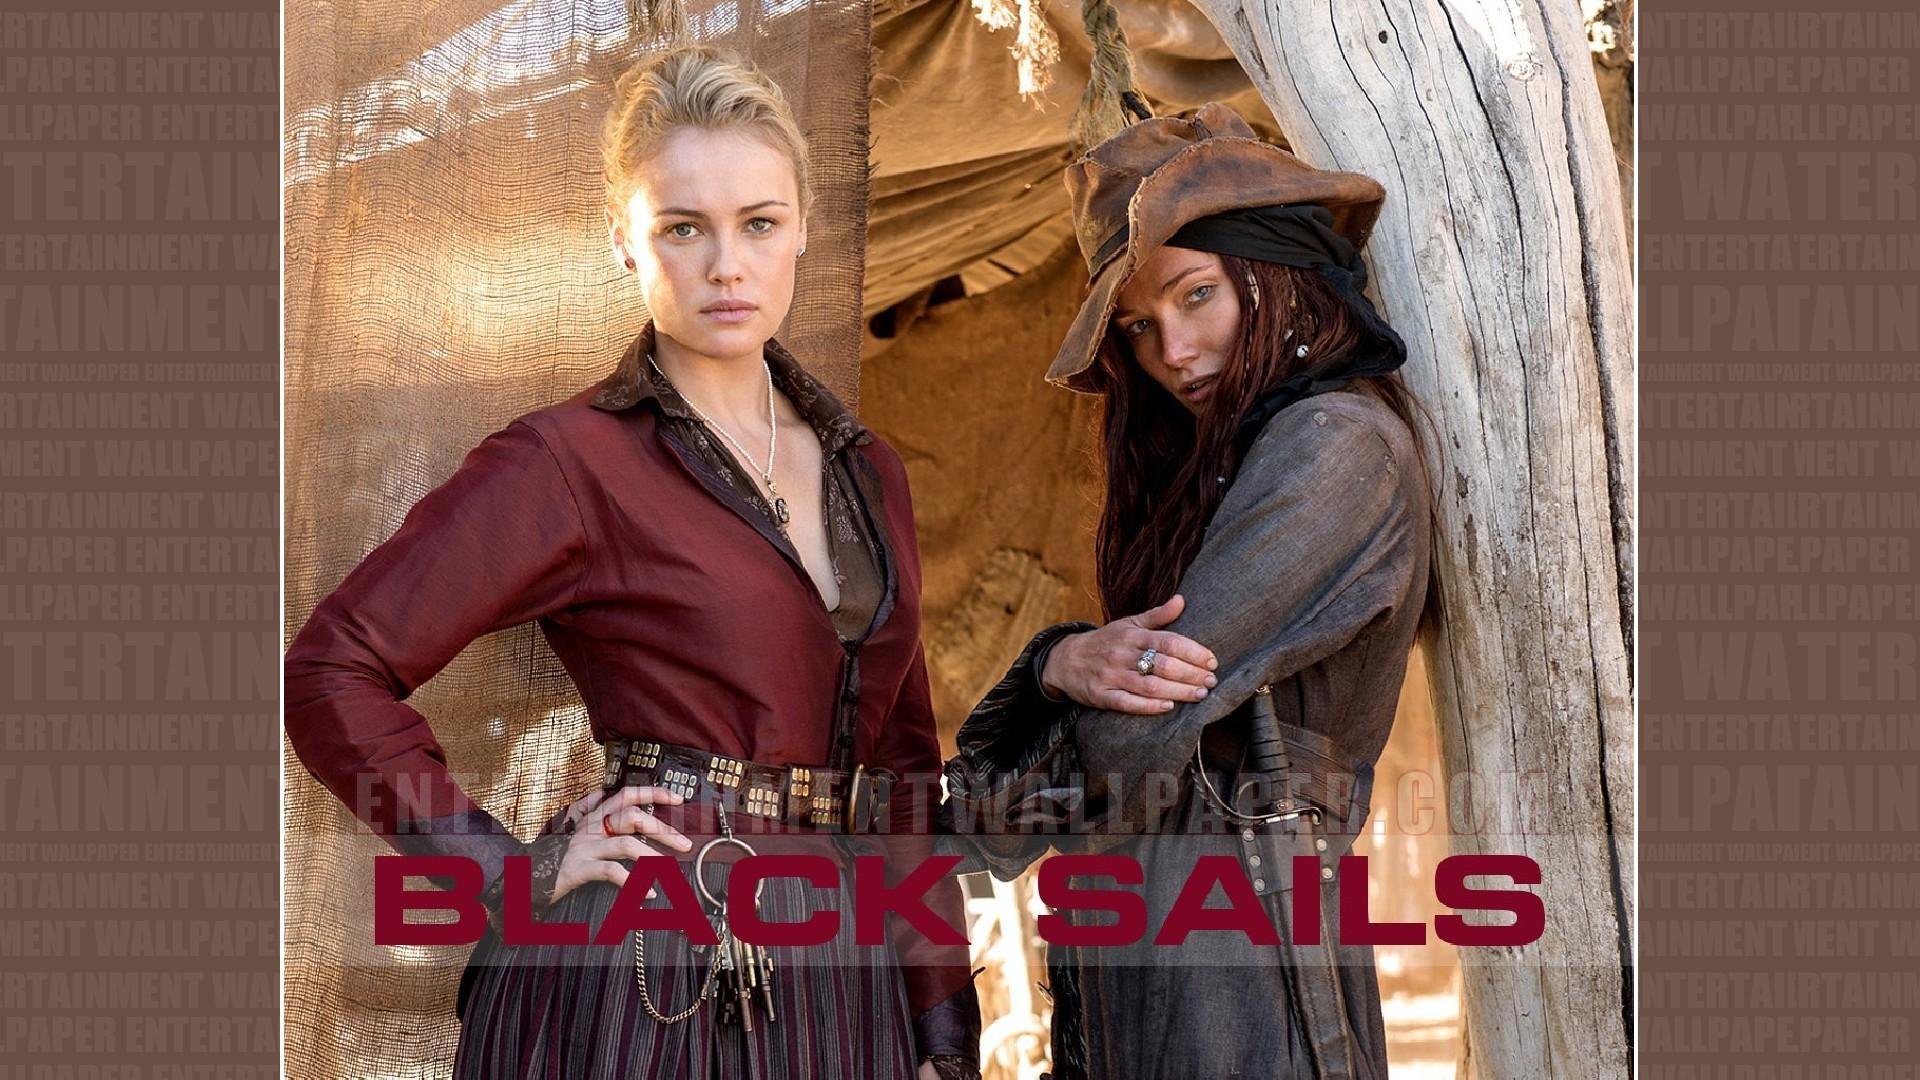 Black Sails Wallpaper – Original size, download now.